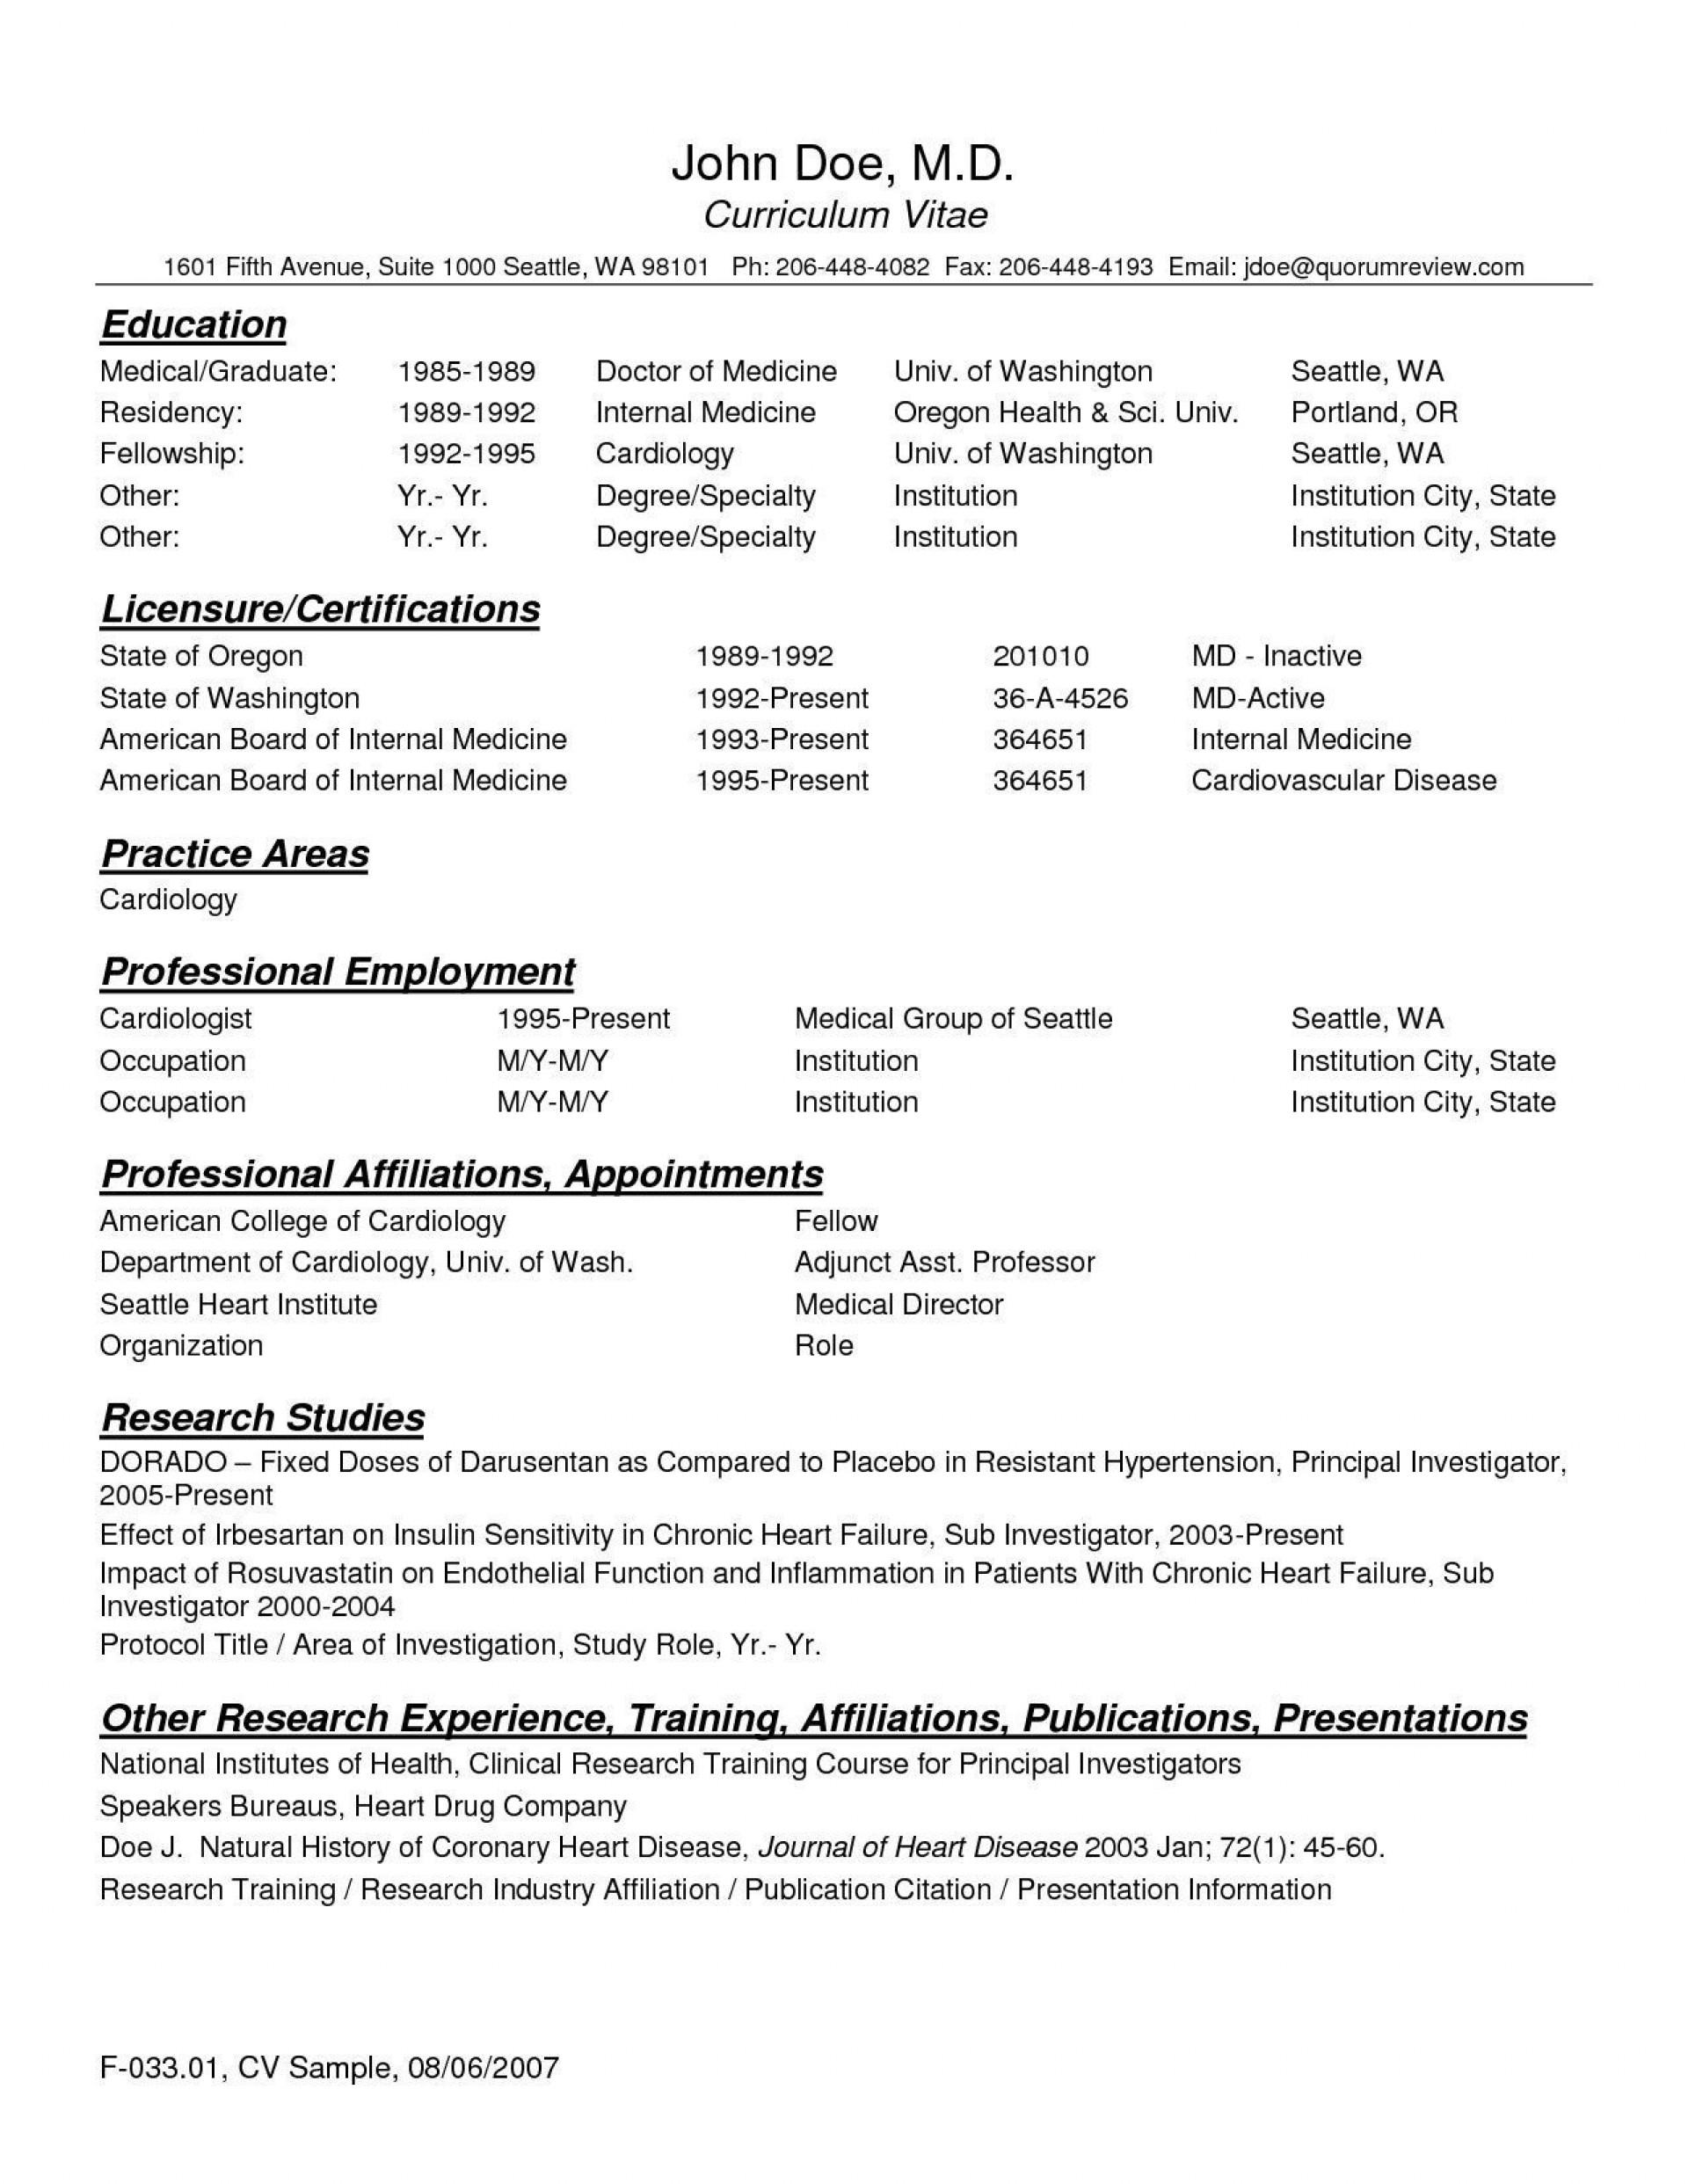 004 Best Medical Curriculum Vitae Template Design  Templates Word Sample Student1920